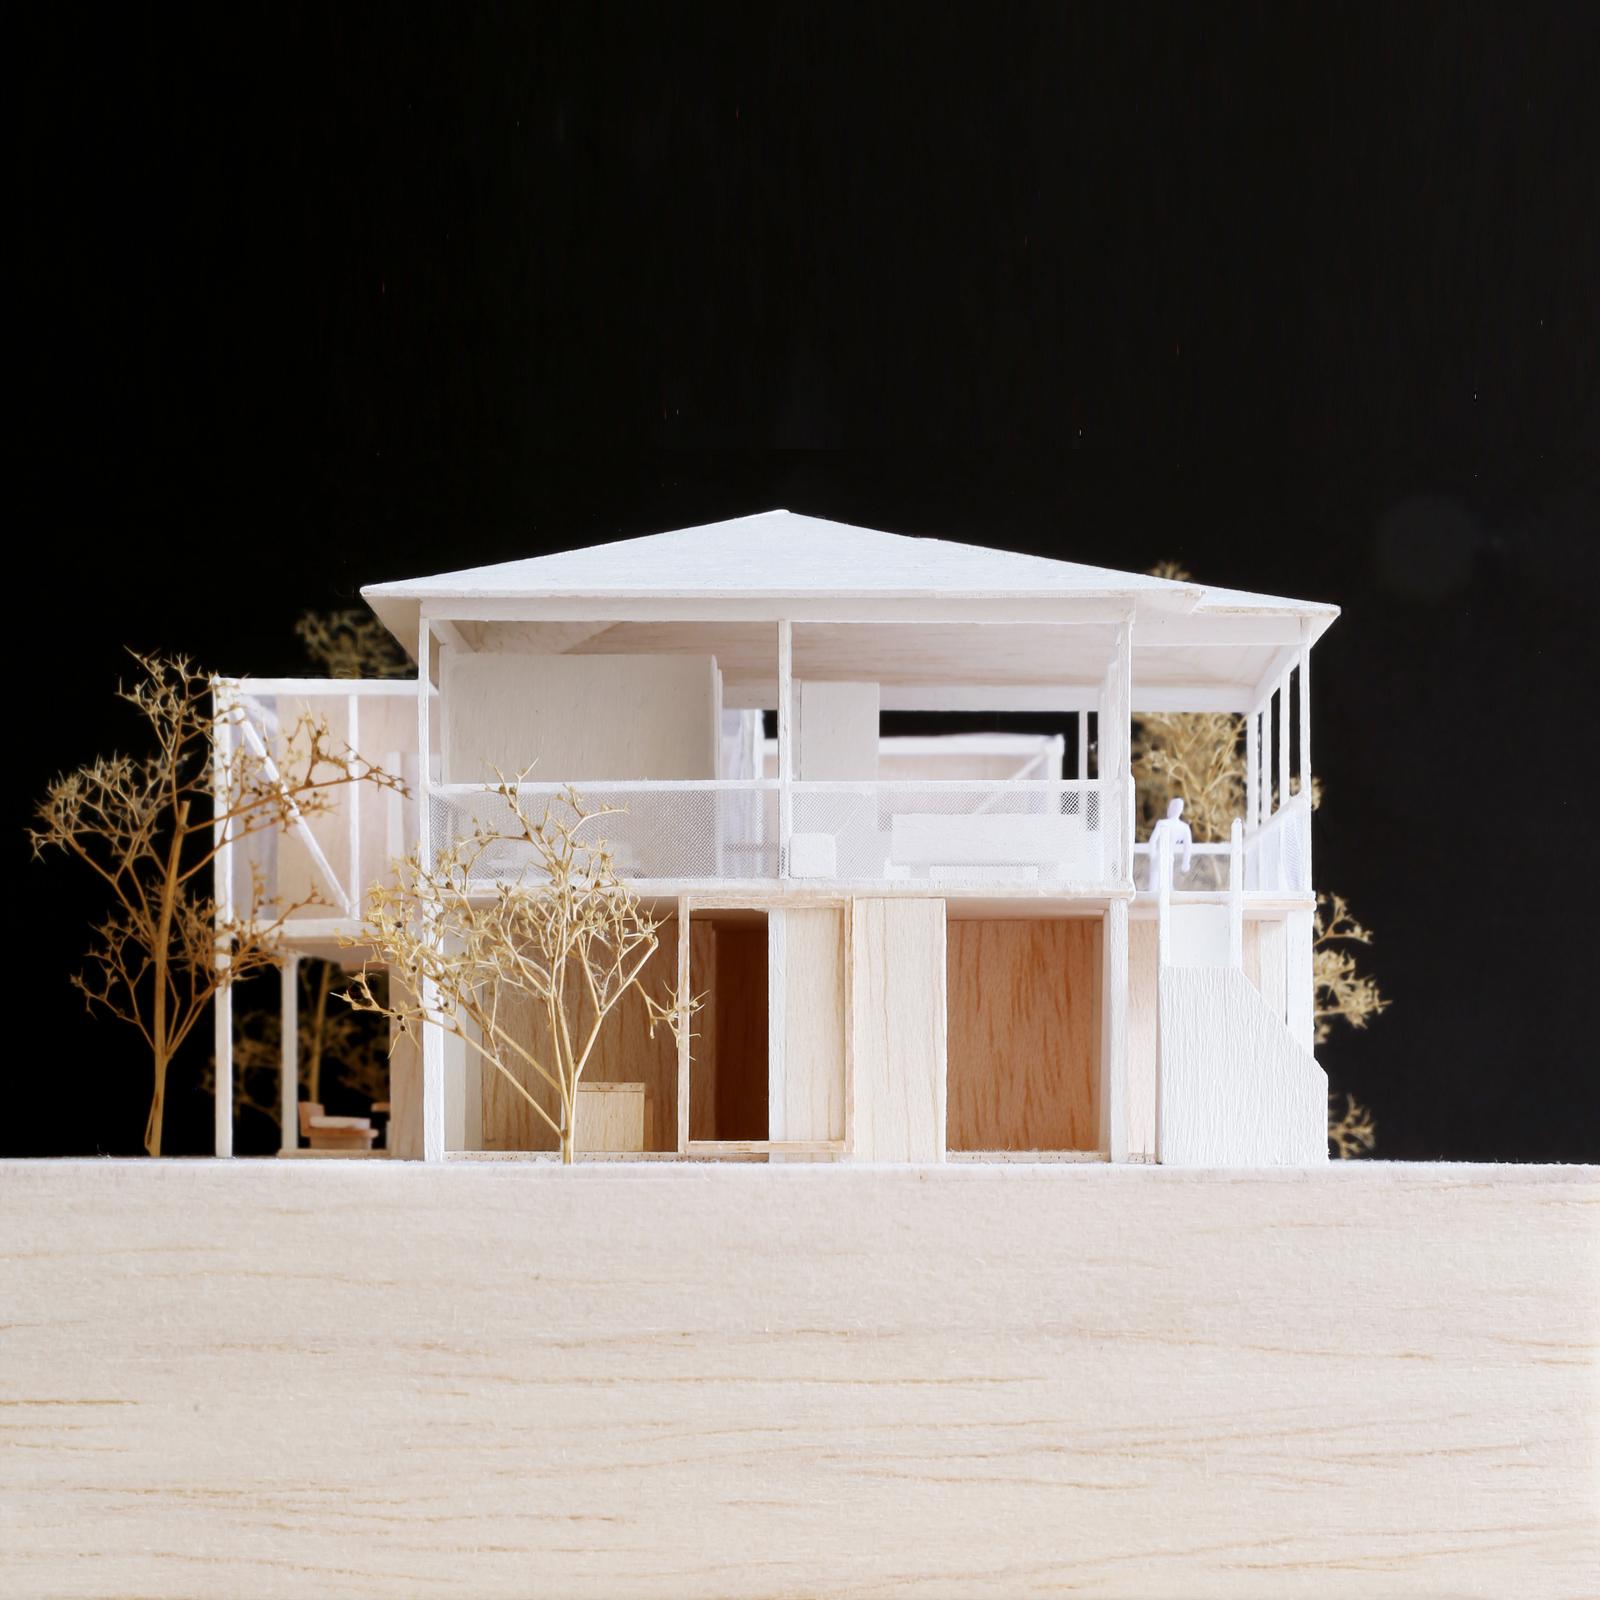 QUEENSLAND-RESIDENTIAL-ARCHITECT-TRIAS-STUDIO-QUEENSLAND-HOUSE-M03